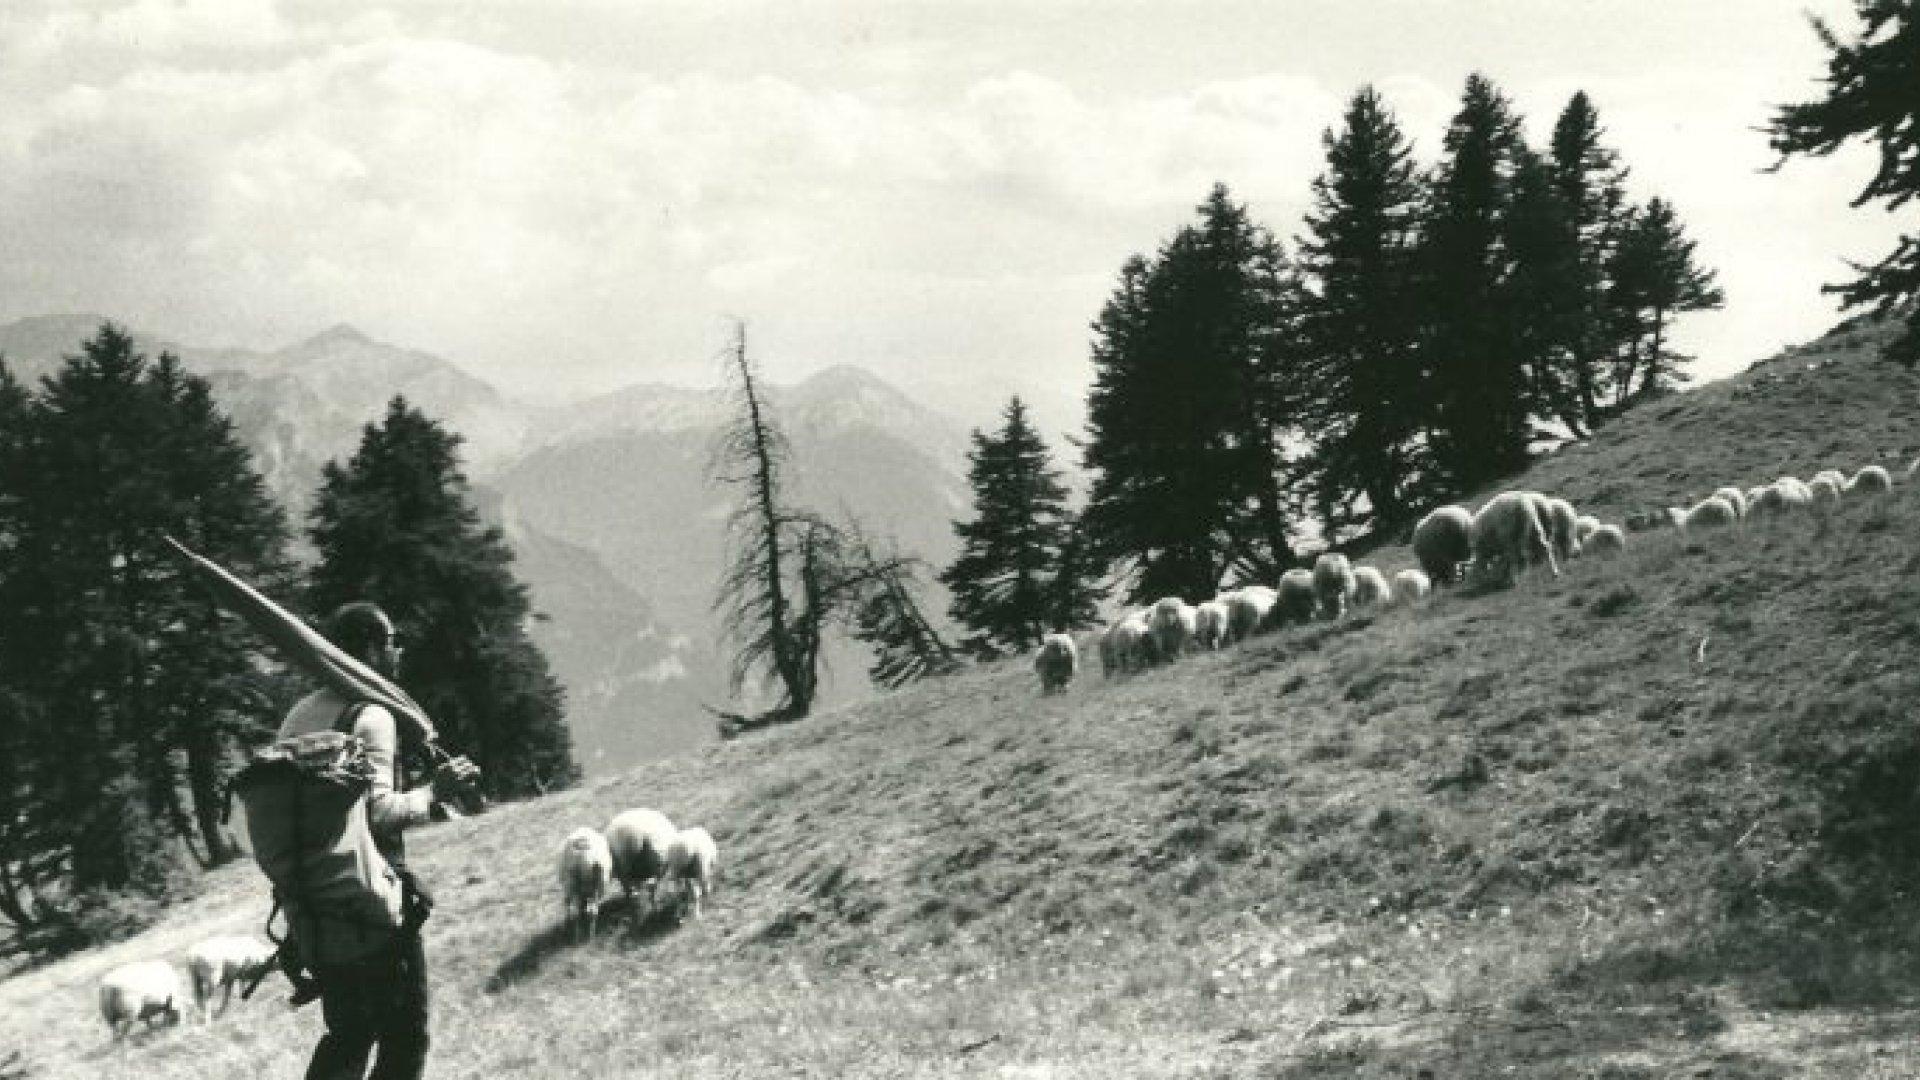 Bergers de l'Alp